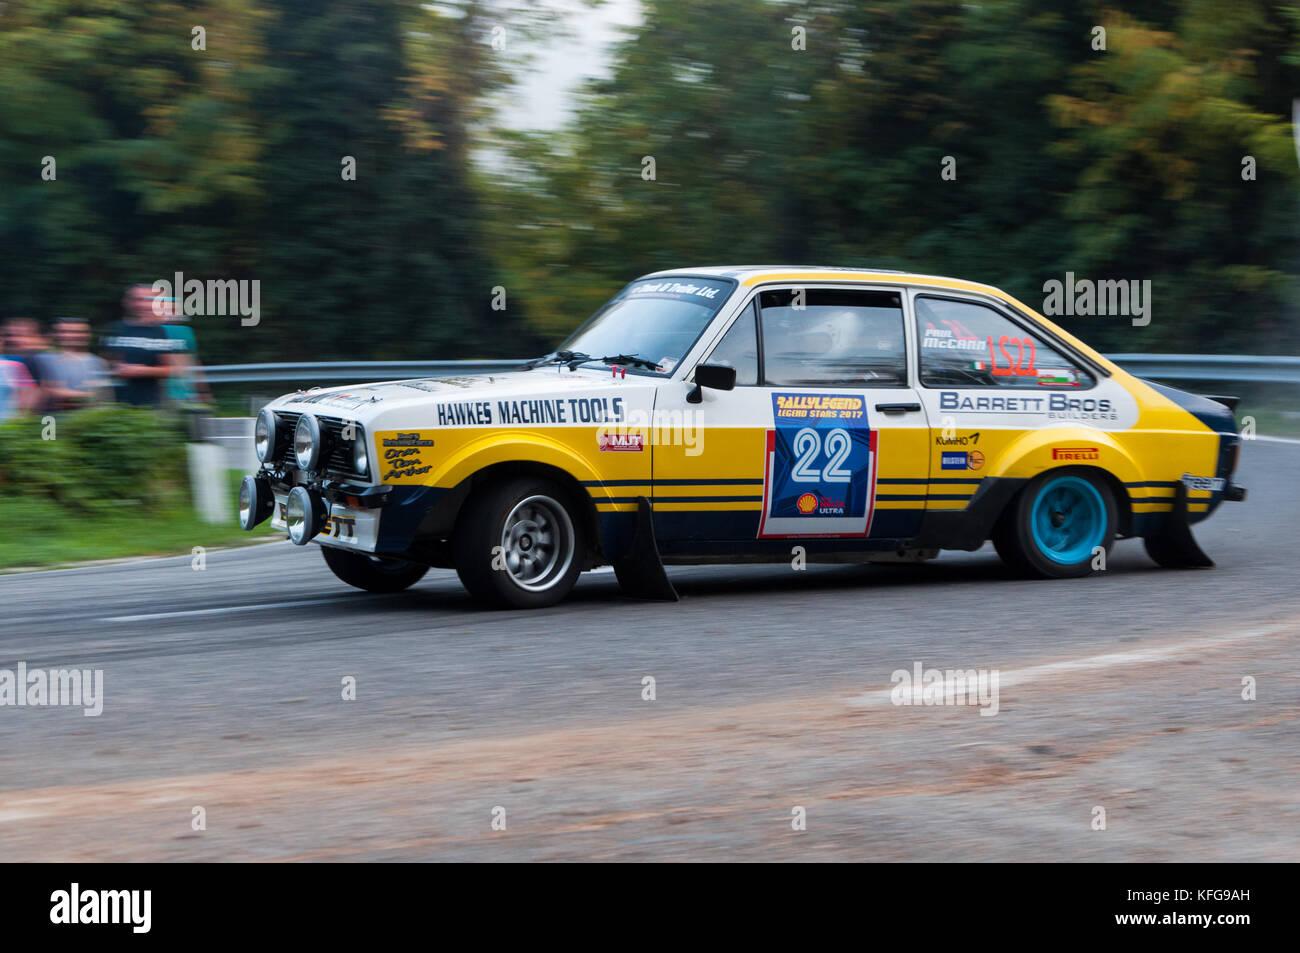 SANMARINO, SANMARINO - OTT 21 : FORD ESCORT RS 1977 old racing car rally THE LEGEND 2017 the famous SAN MARINO historical - Stock Image